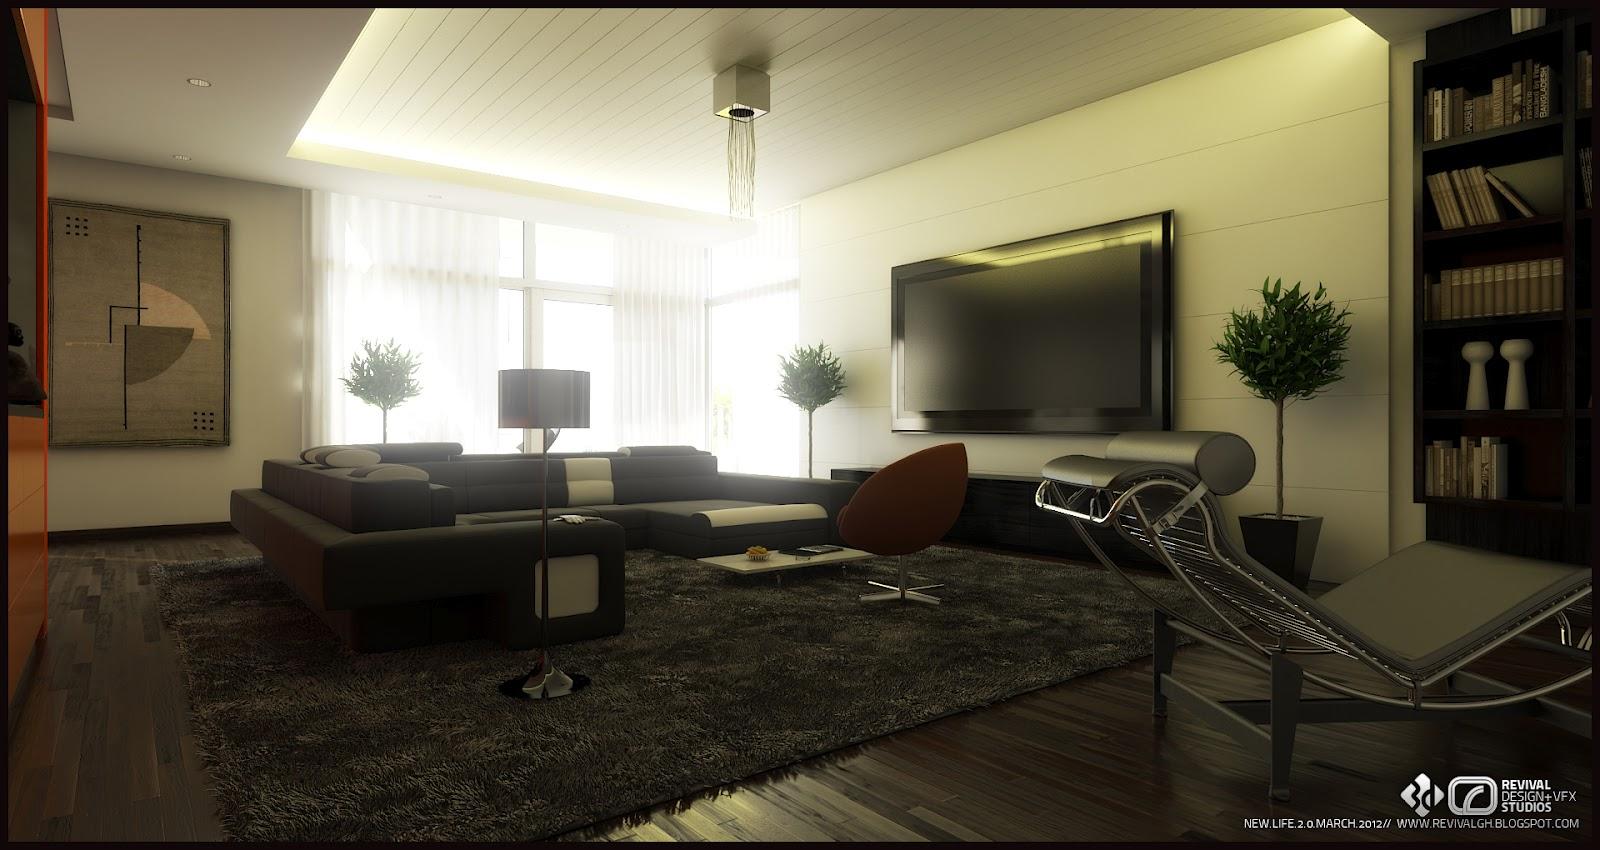 Premier place interior design 3d visualization r d v s for Interior design places